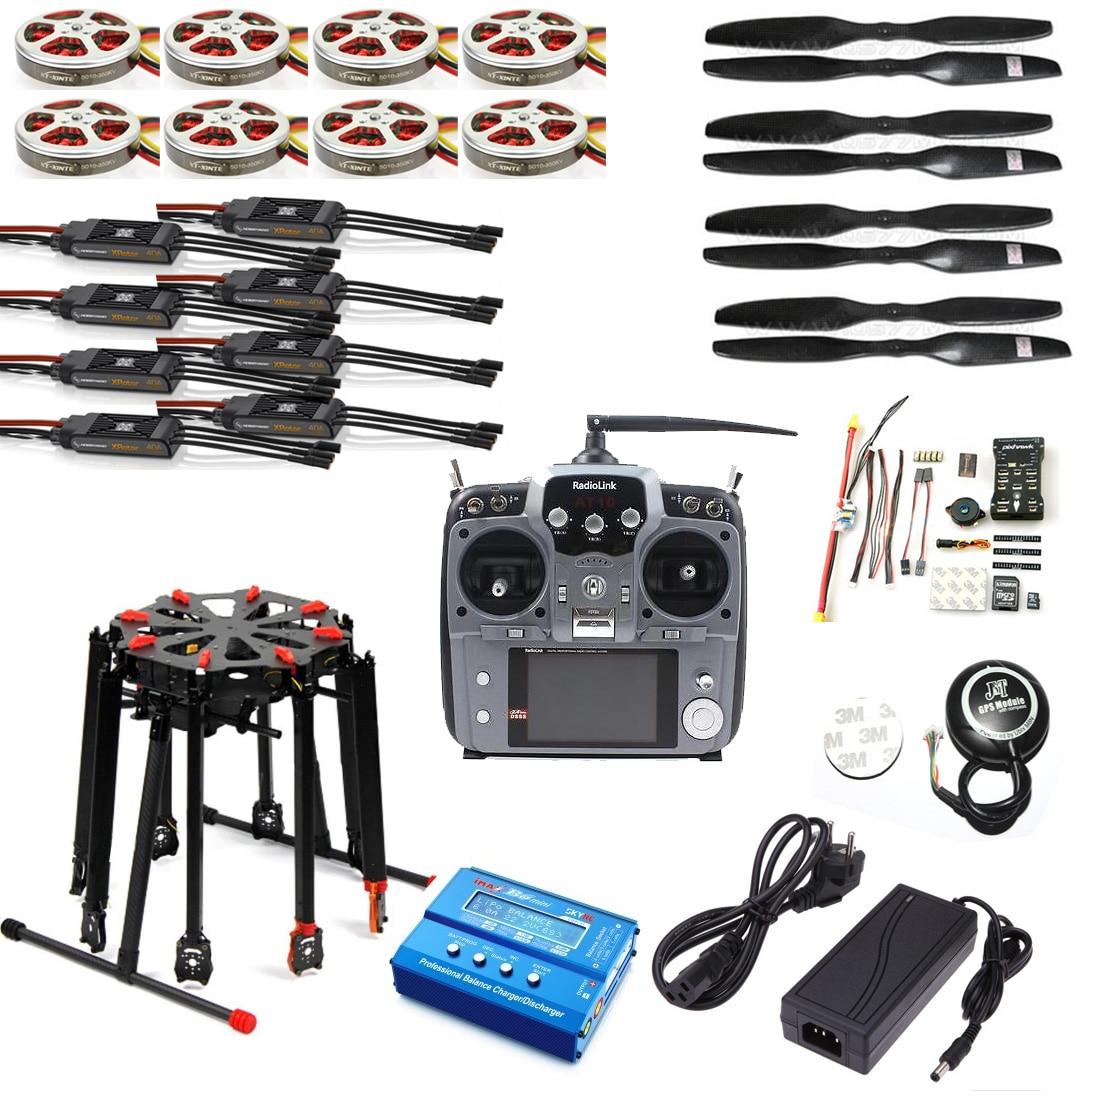 JMT Pro 2.4G 10CH RC 8-Axle Tarot X8 Folding PIX PX4 M8N GPS ARF/PNF DIY Unassembly Kit Motor ESC Octocopter Drone F11270-A/B/C f11270 tarot x8 8 aixs umbrella type folding multicopter uav octocopter drone tl8x000 with retractable landing gear